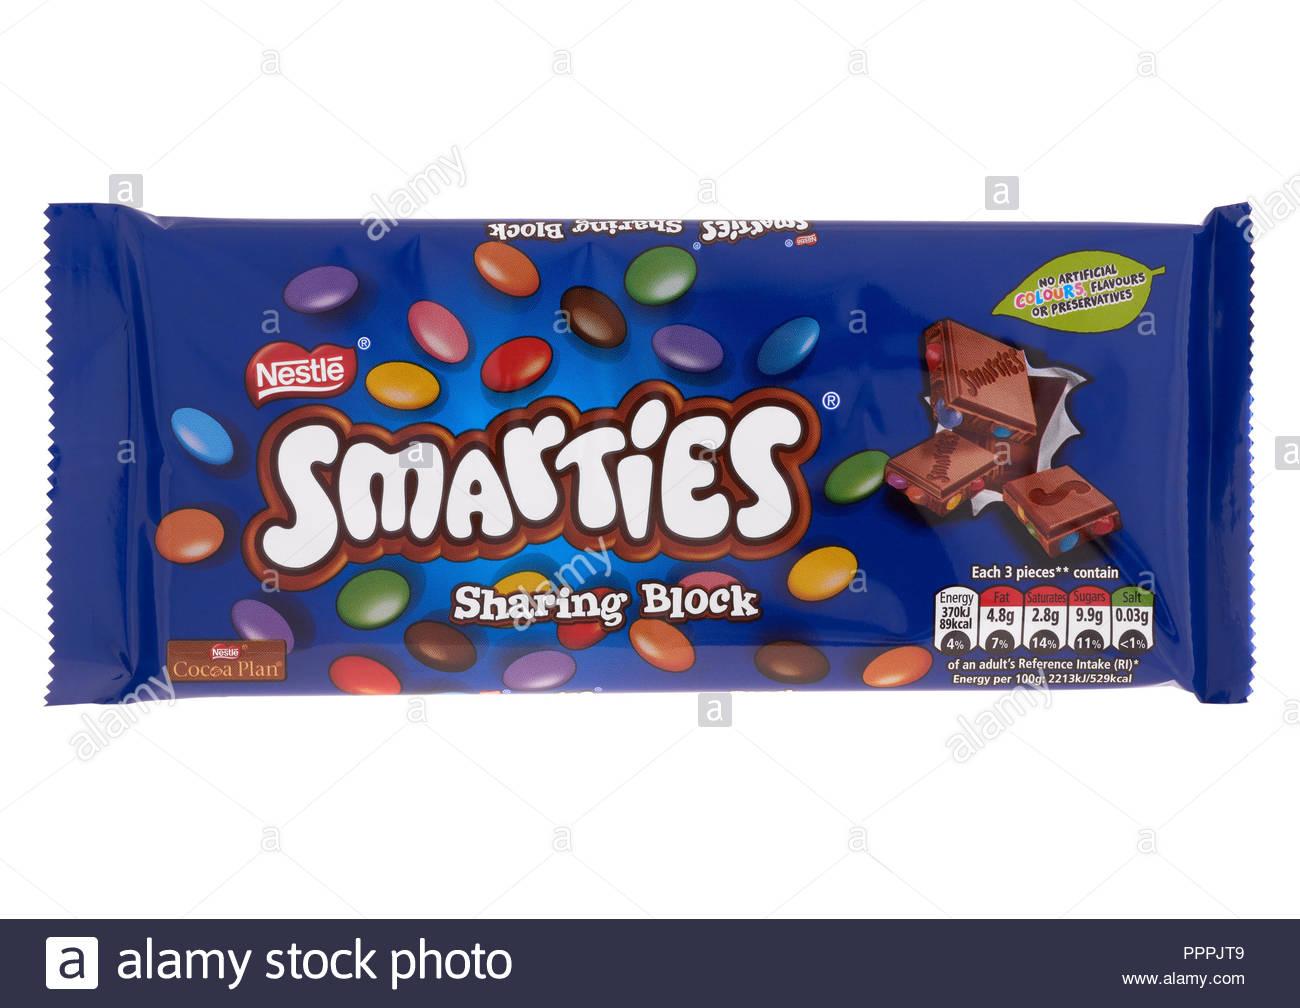 Nestle Smarties sharing block chocolate bar on white background 1300x1008